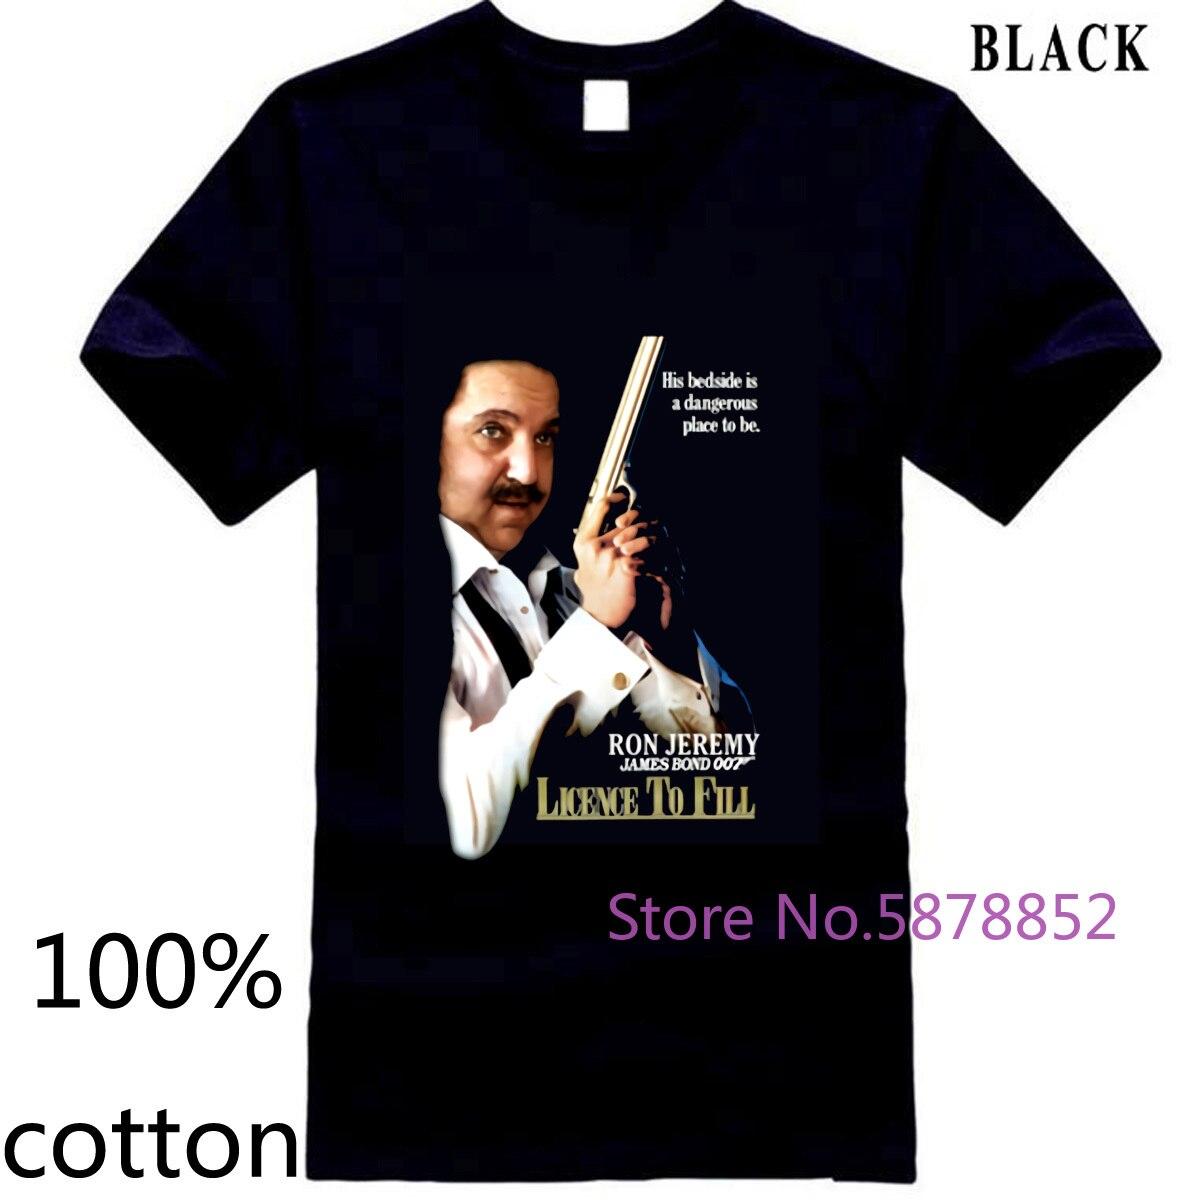 Ron Jeremy 007 licencia para llenar porno Cool hombres camiseta tops camisetas 100% algodón 3XL 4XL 5XL manga corta